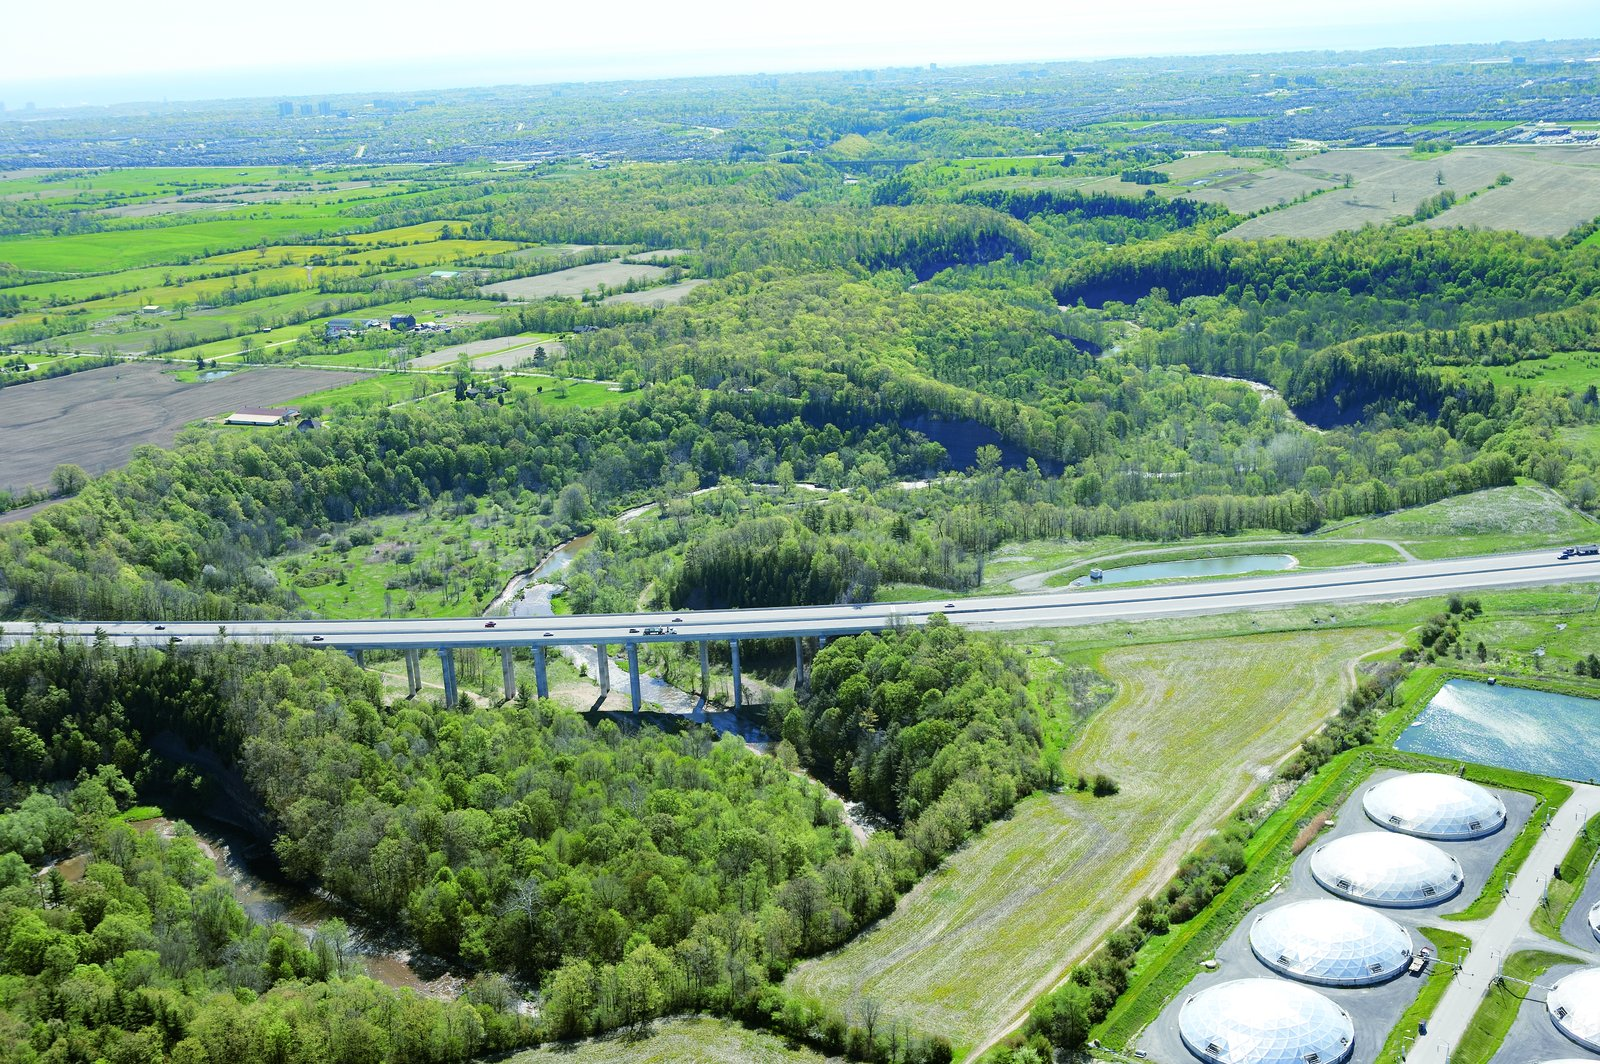 2005 Aerial Photographs, Near Halton Region Biosolids Management Centre